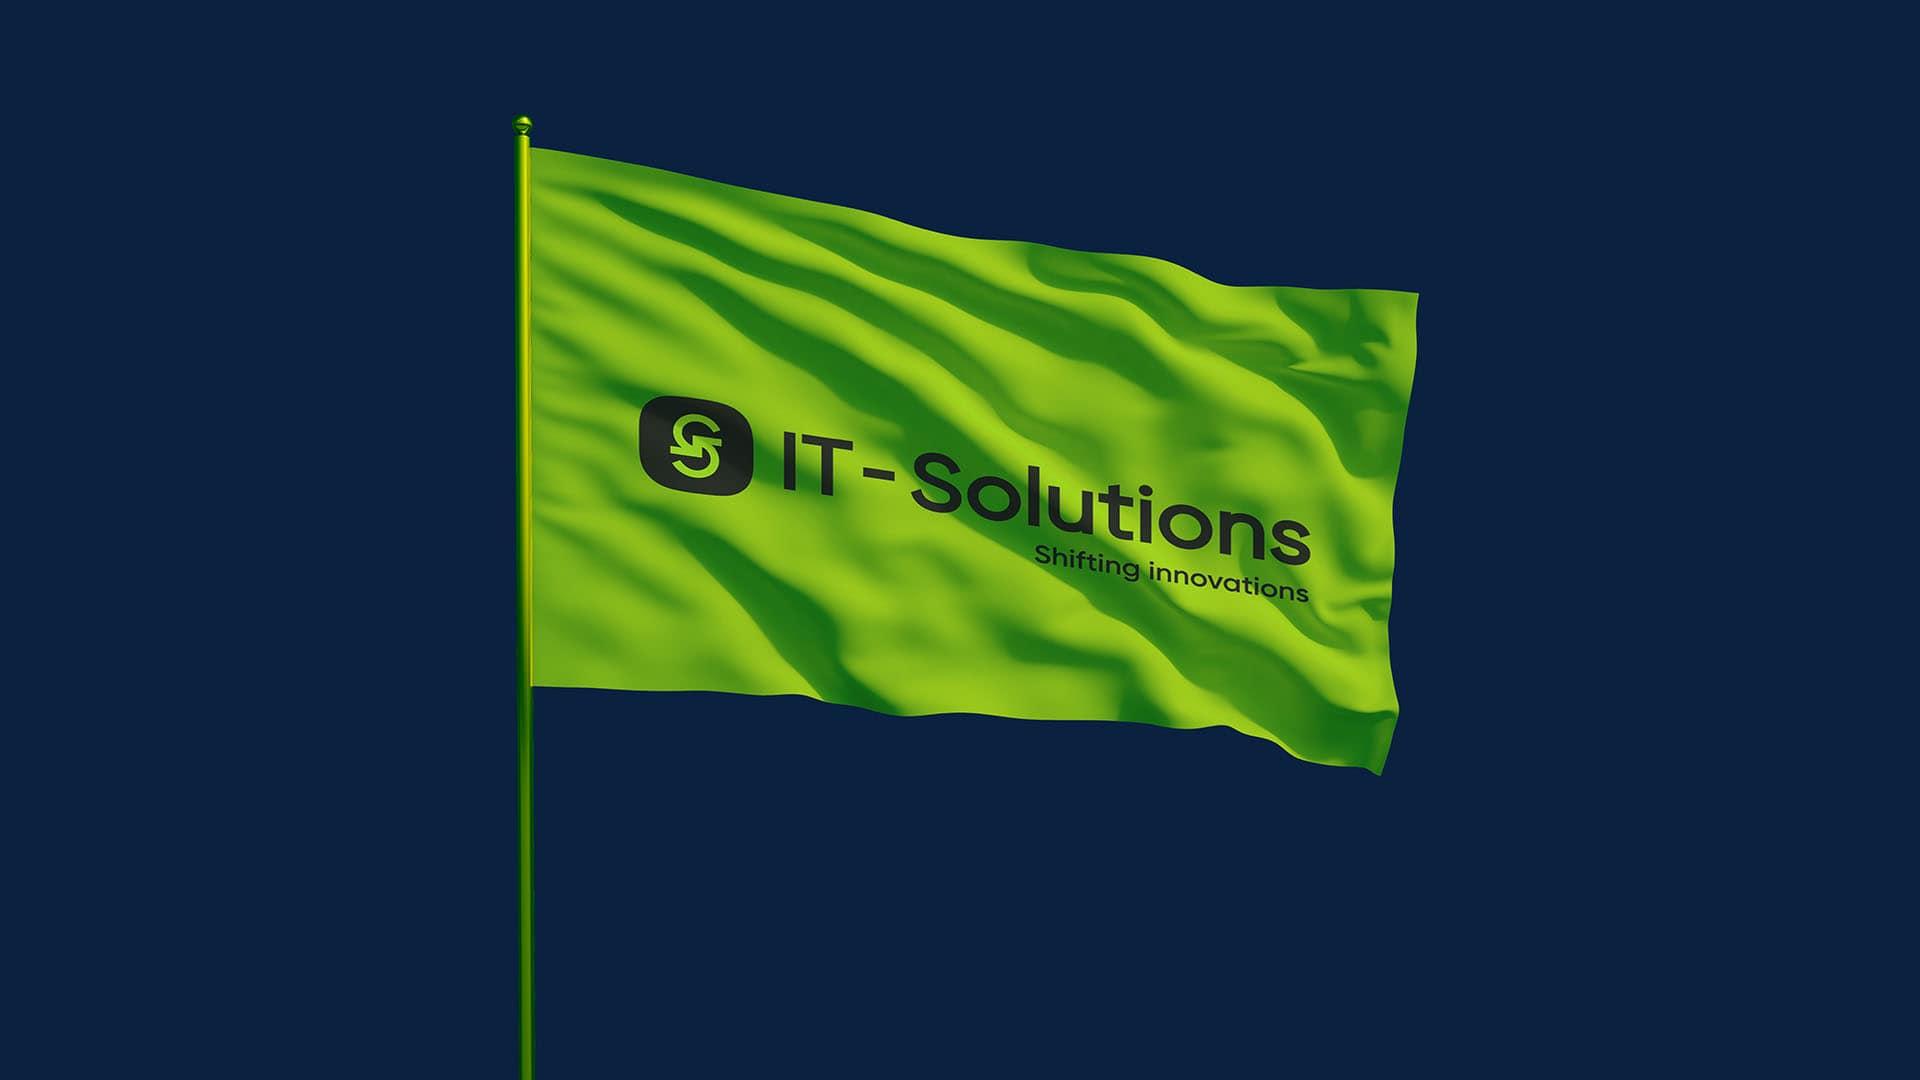 gra brand design it solutions main